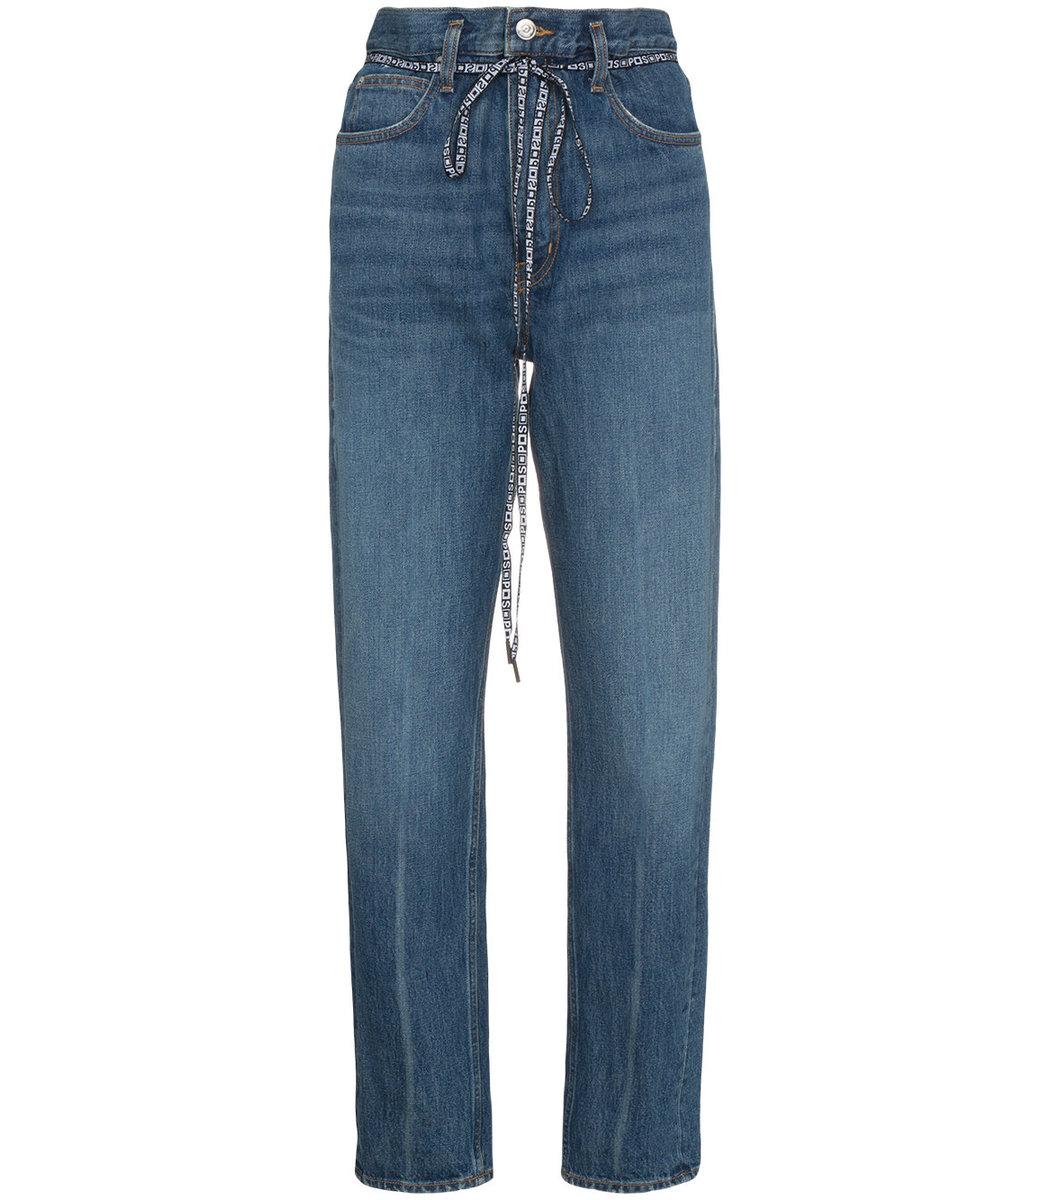 PSWL Paperbag Jeans - Blue Proenza Schouler 0lg7OhS